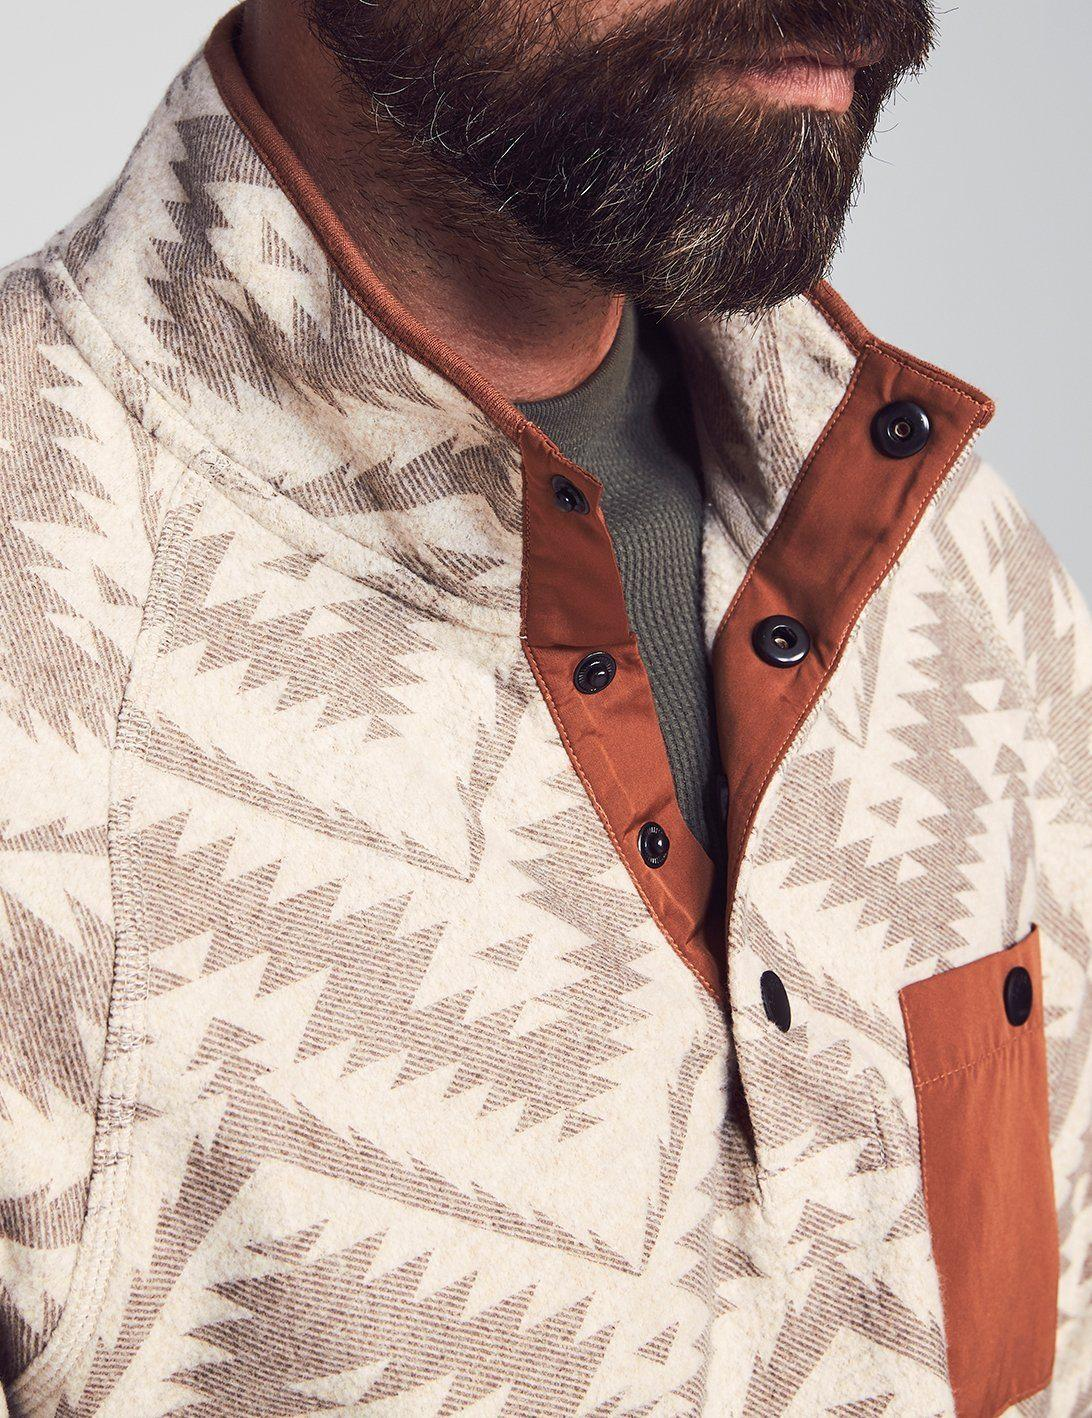 Gnao Mens Long Sleeve Autumn Flap Pockets Button Up Striped Classic Dress Shirts